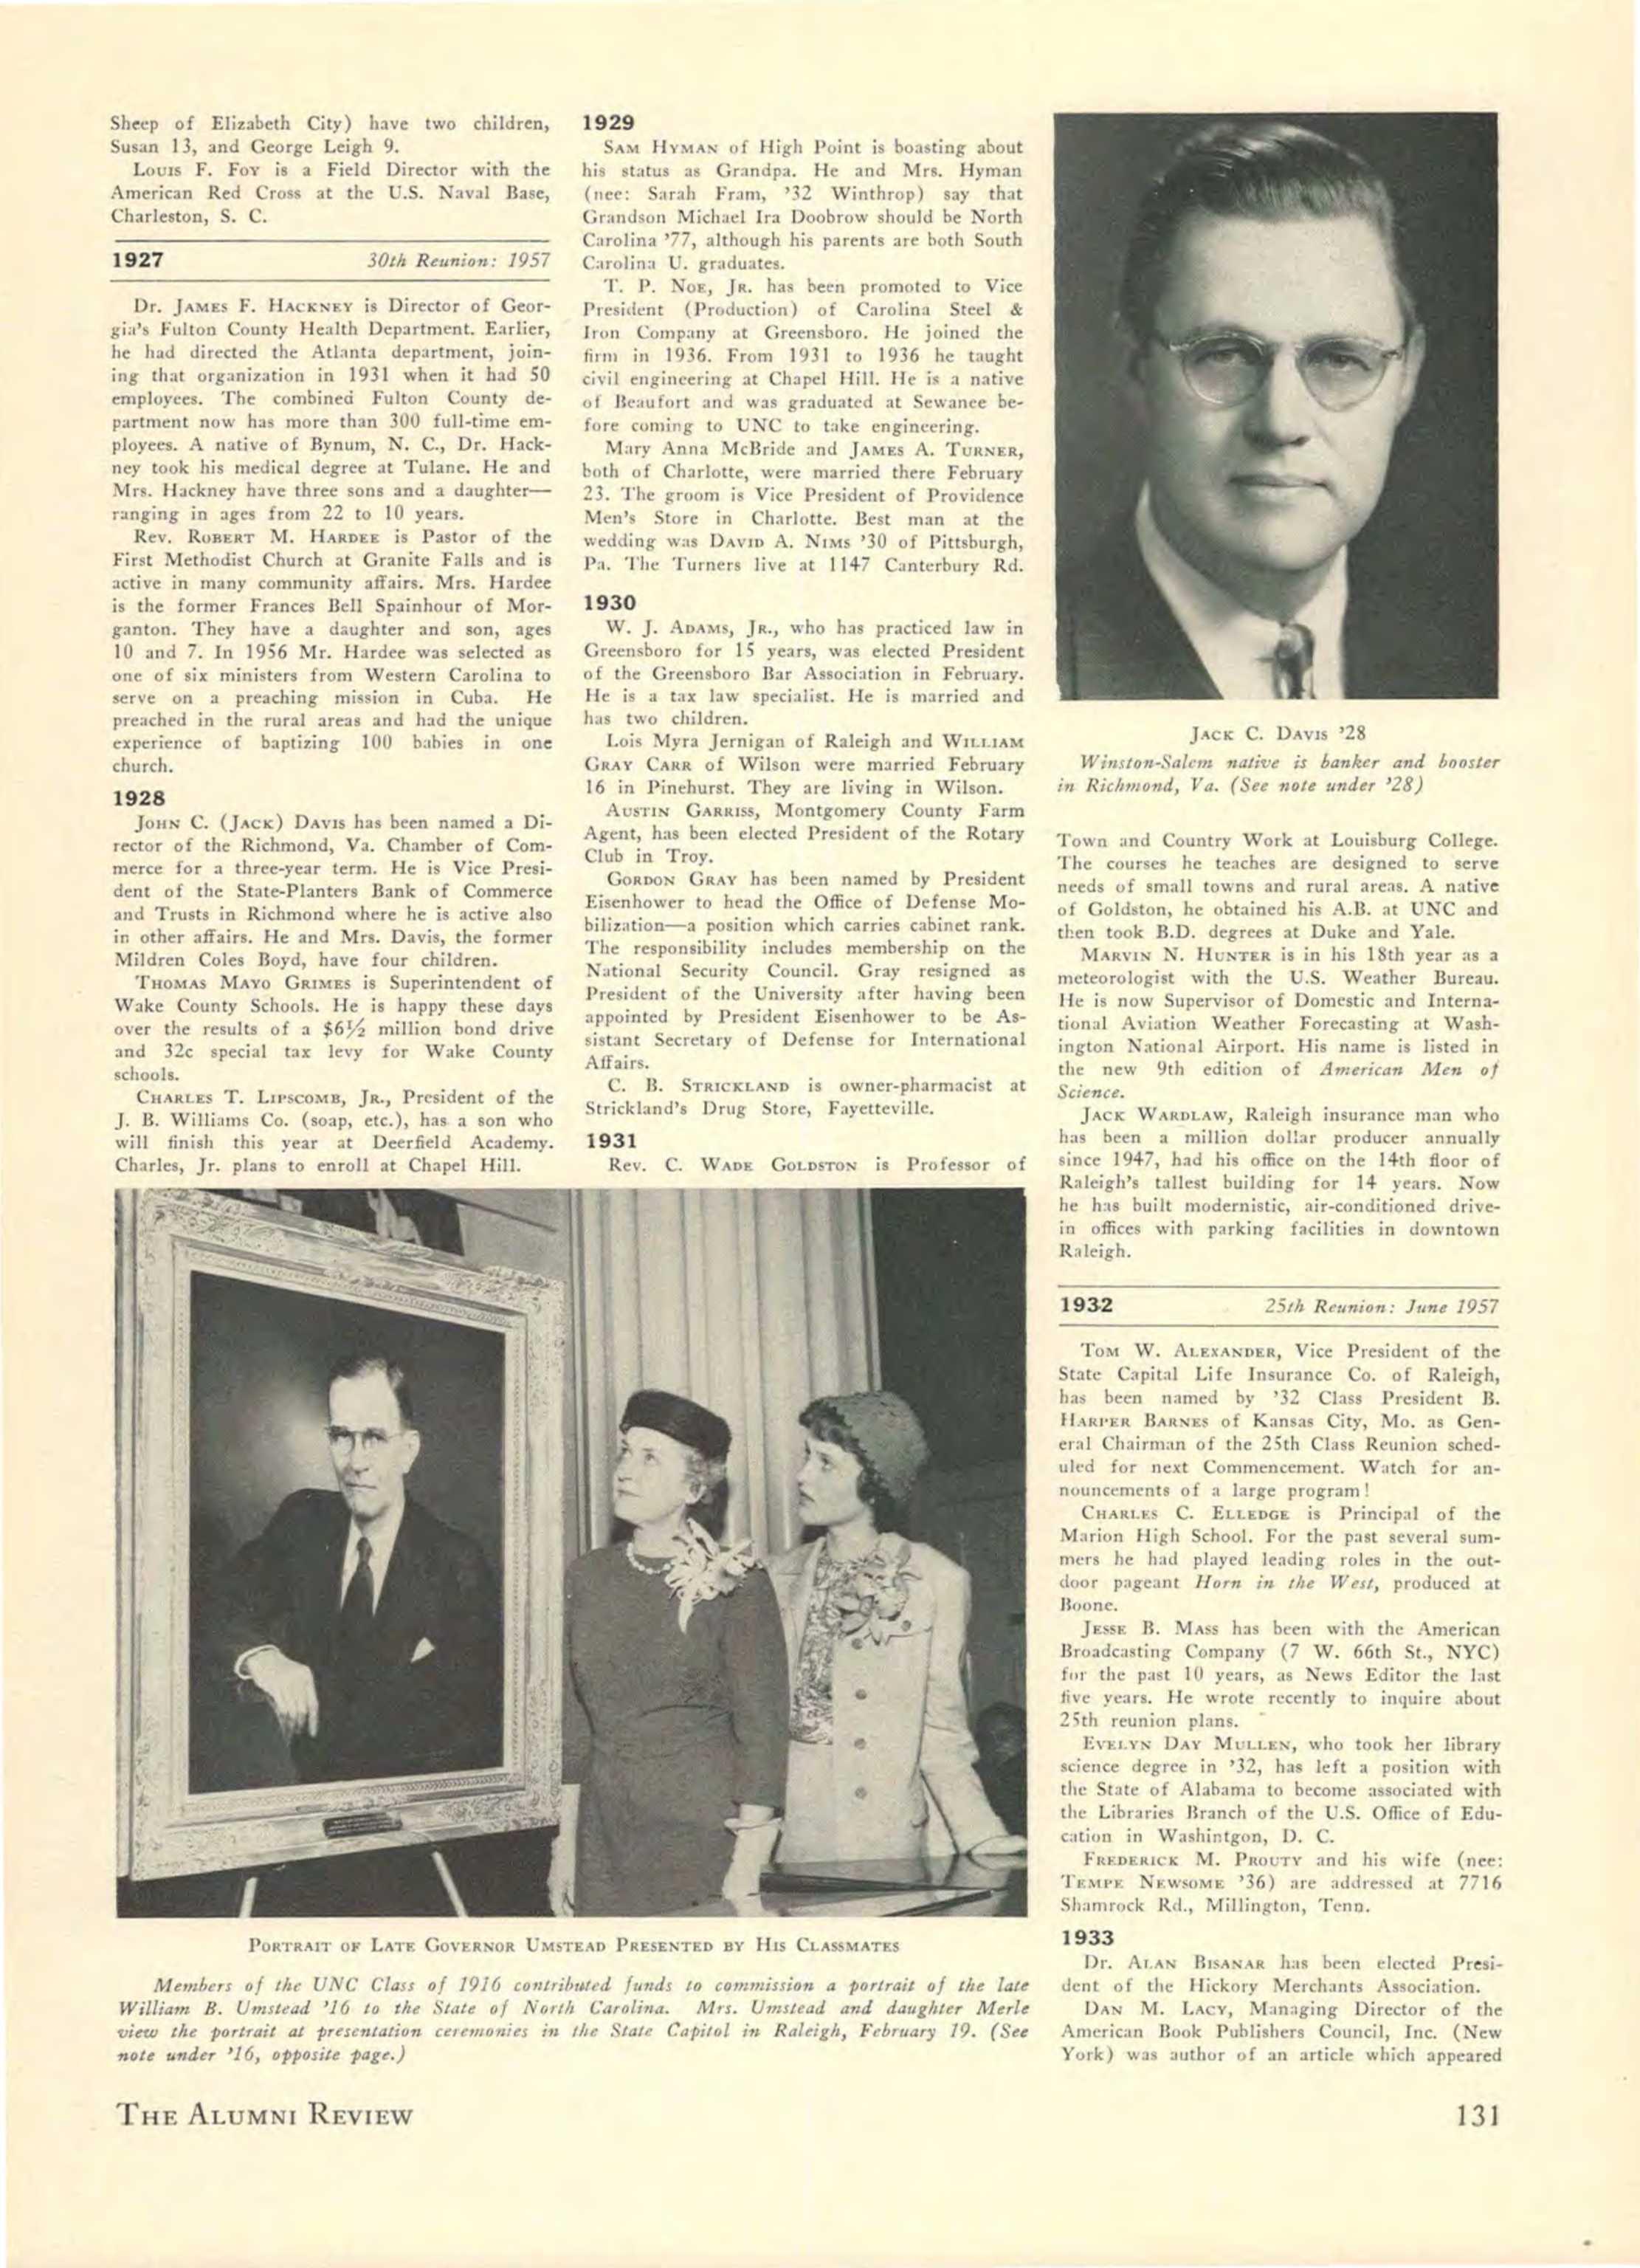 1957 THE CEREMONIES OF INAUGURATION OF BILL FRIDAY UNIVERSITY OF NORTH CAROLINA